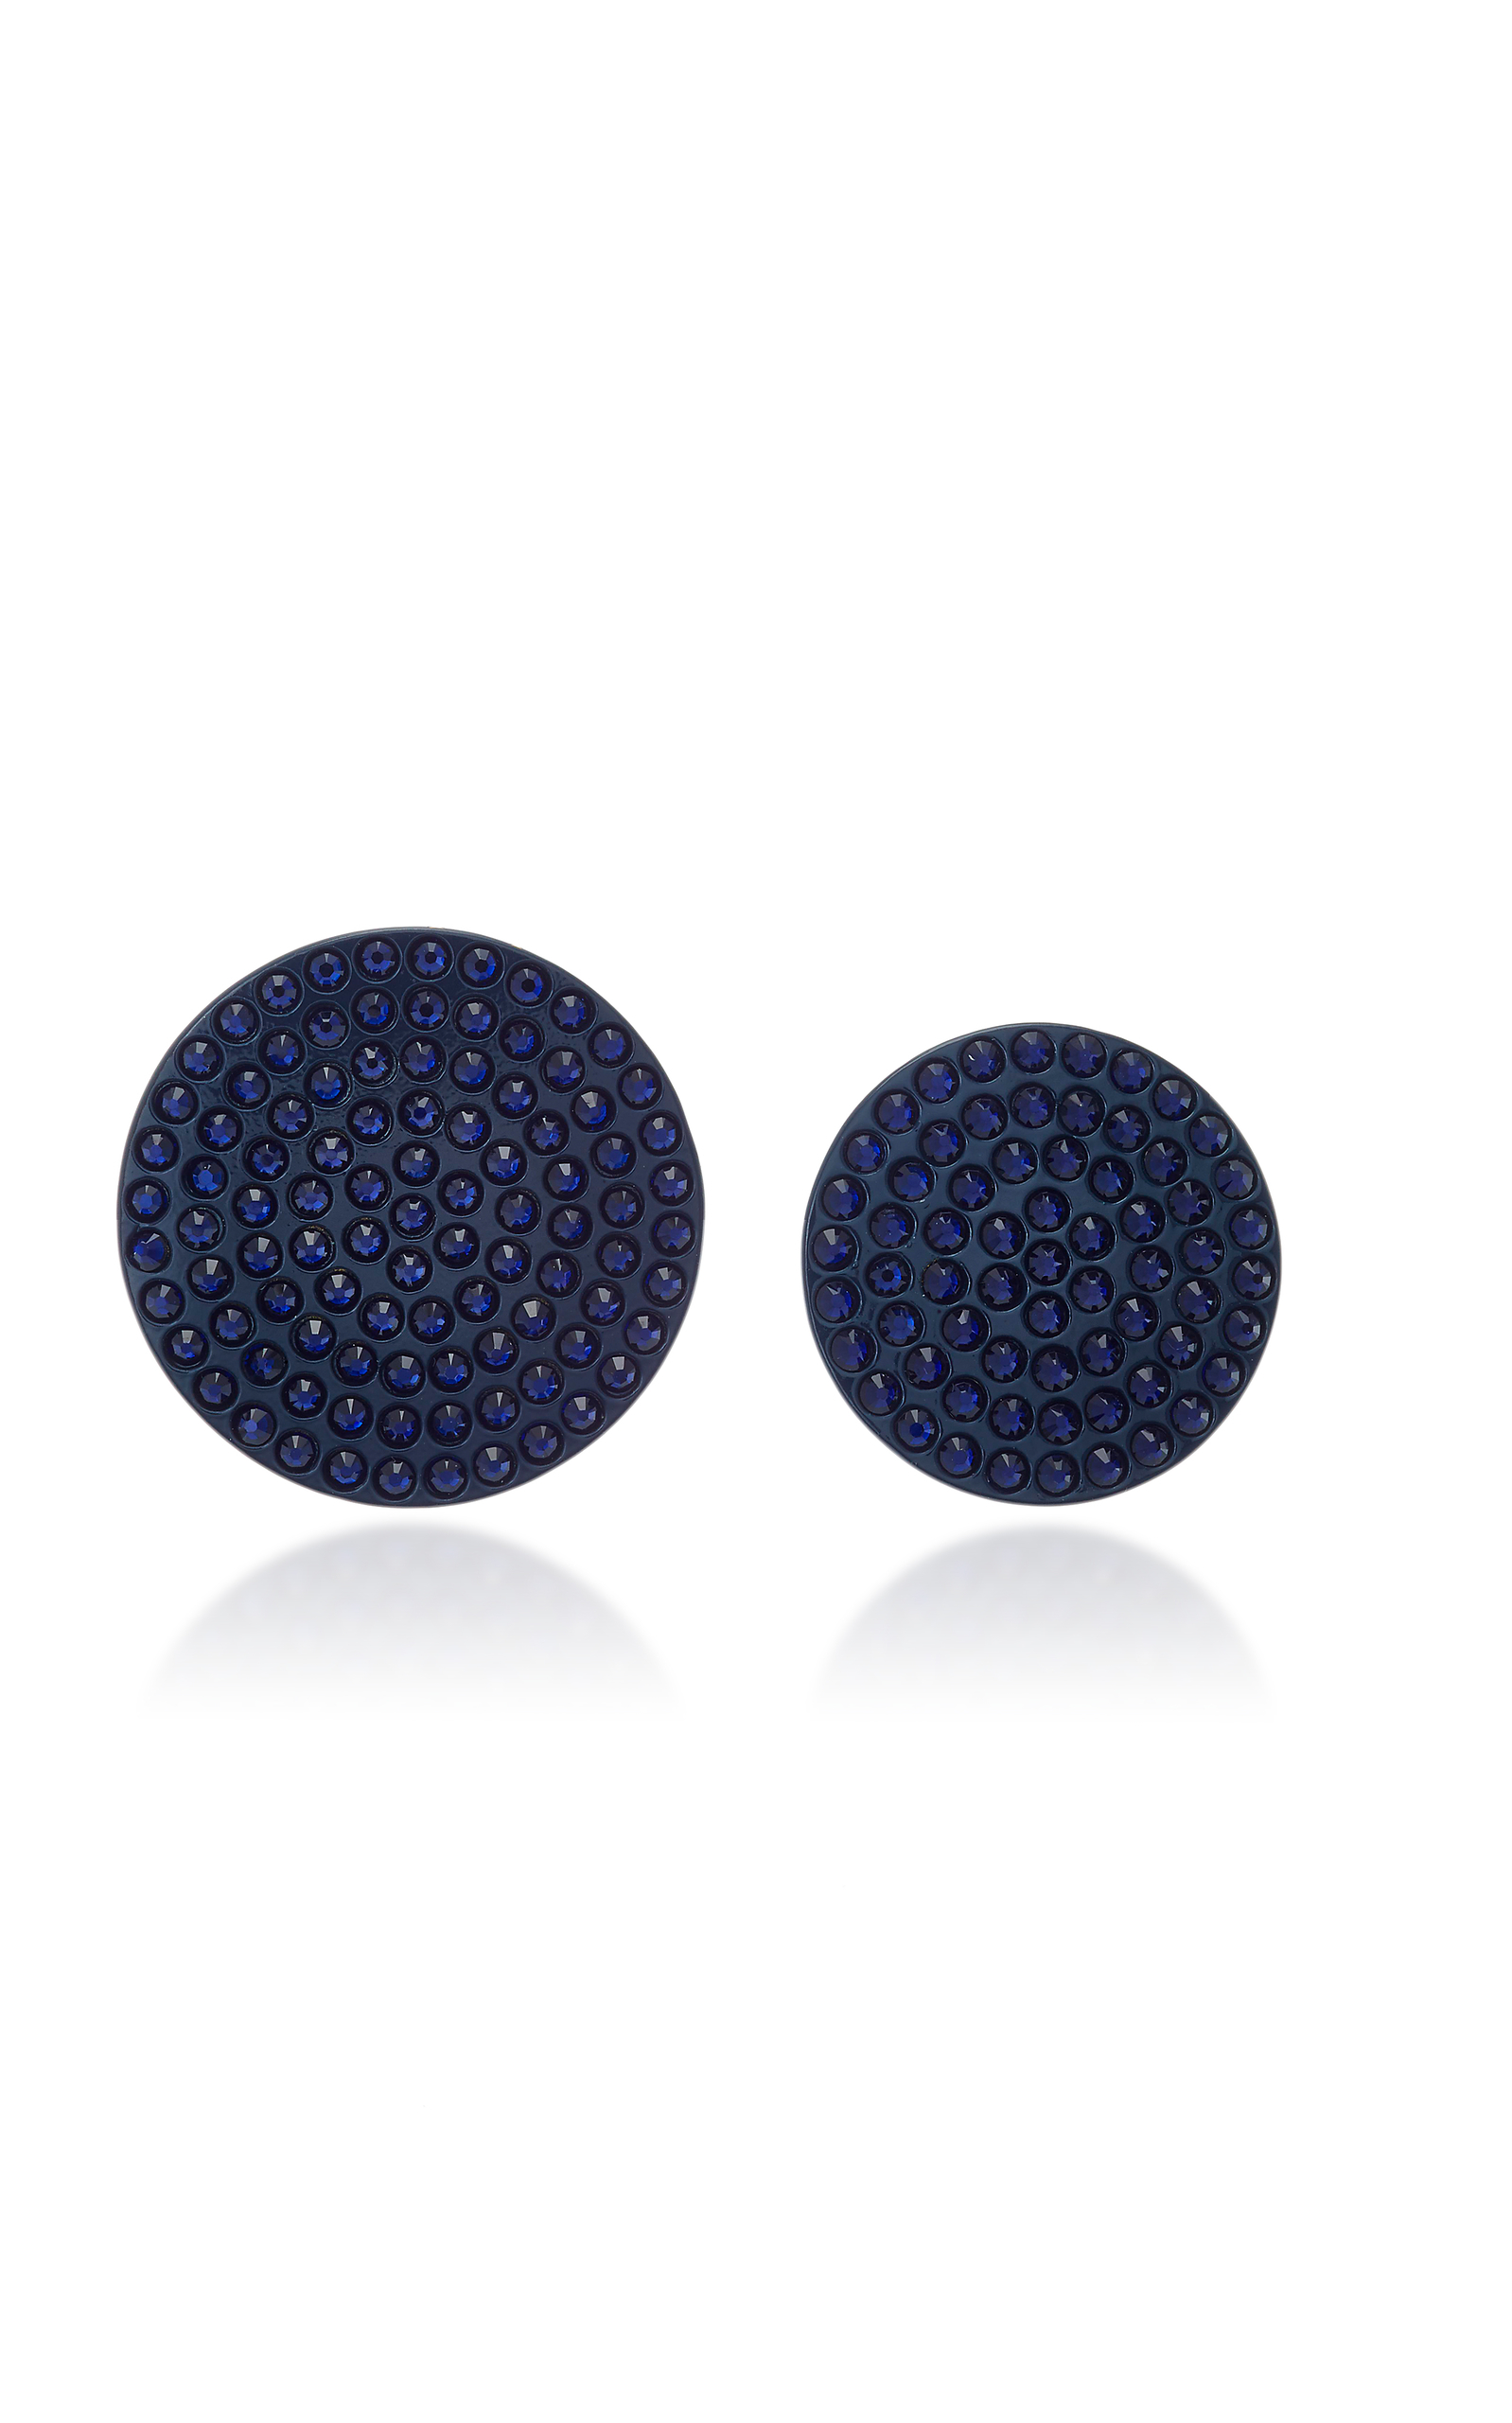 Roxanne Assoulin Full Moon Navy Earrings ulVQKnfz